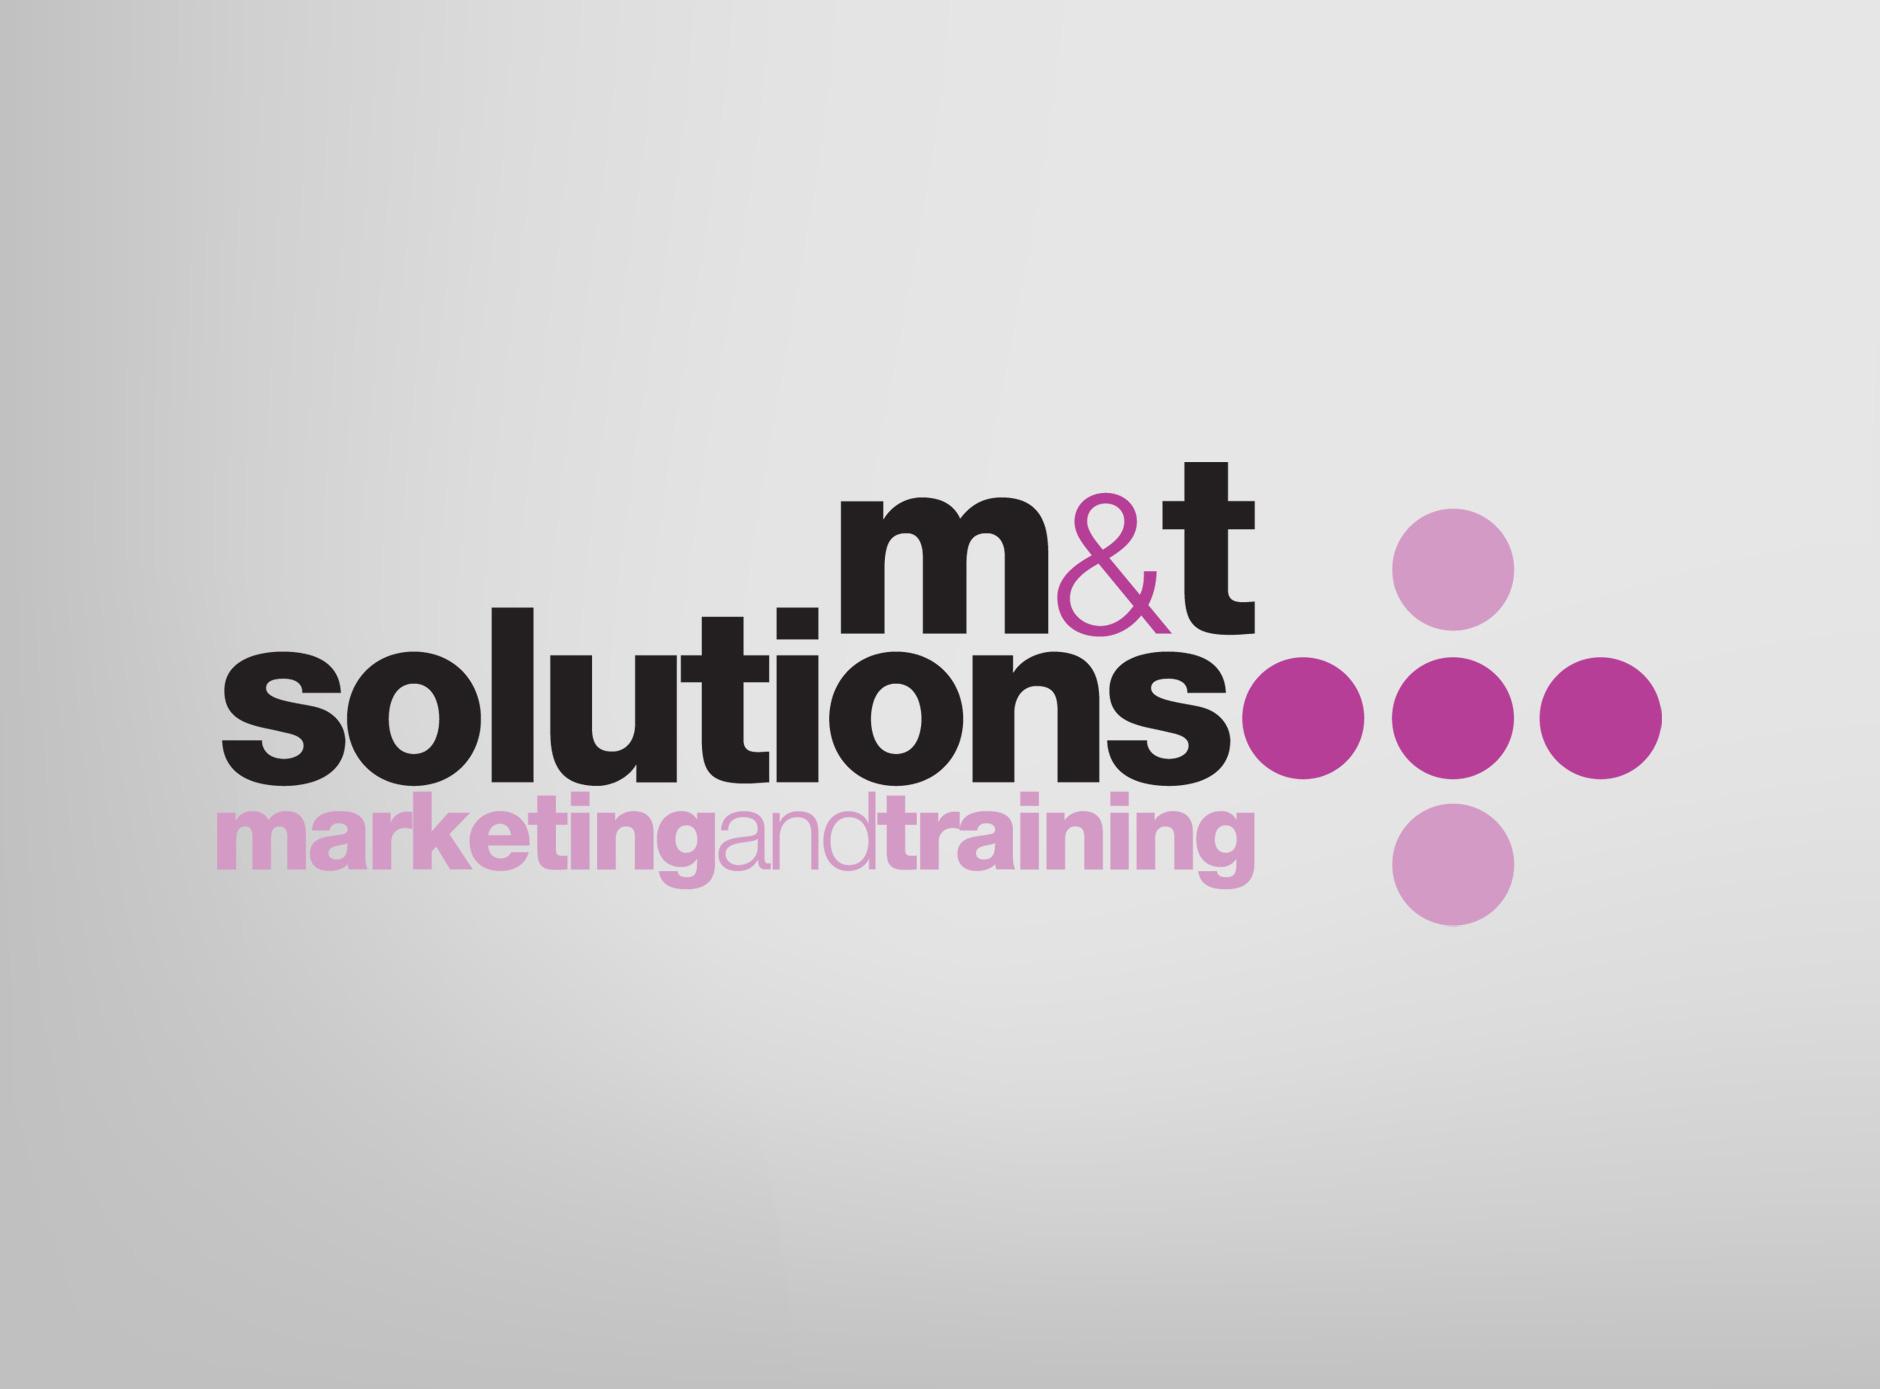 M&T Solutions identity